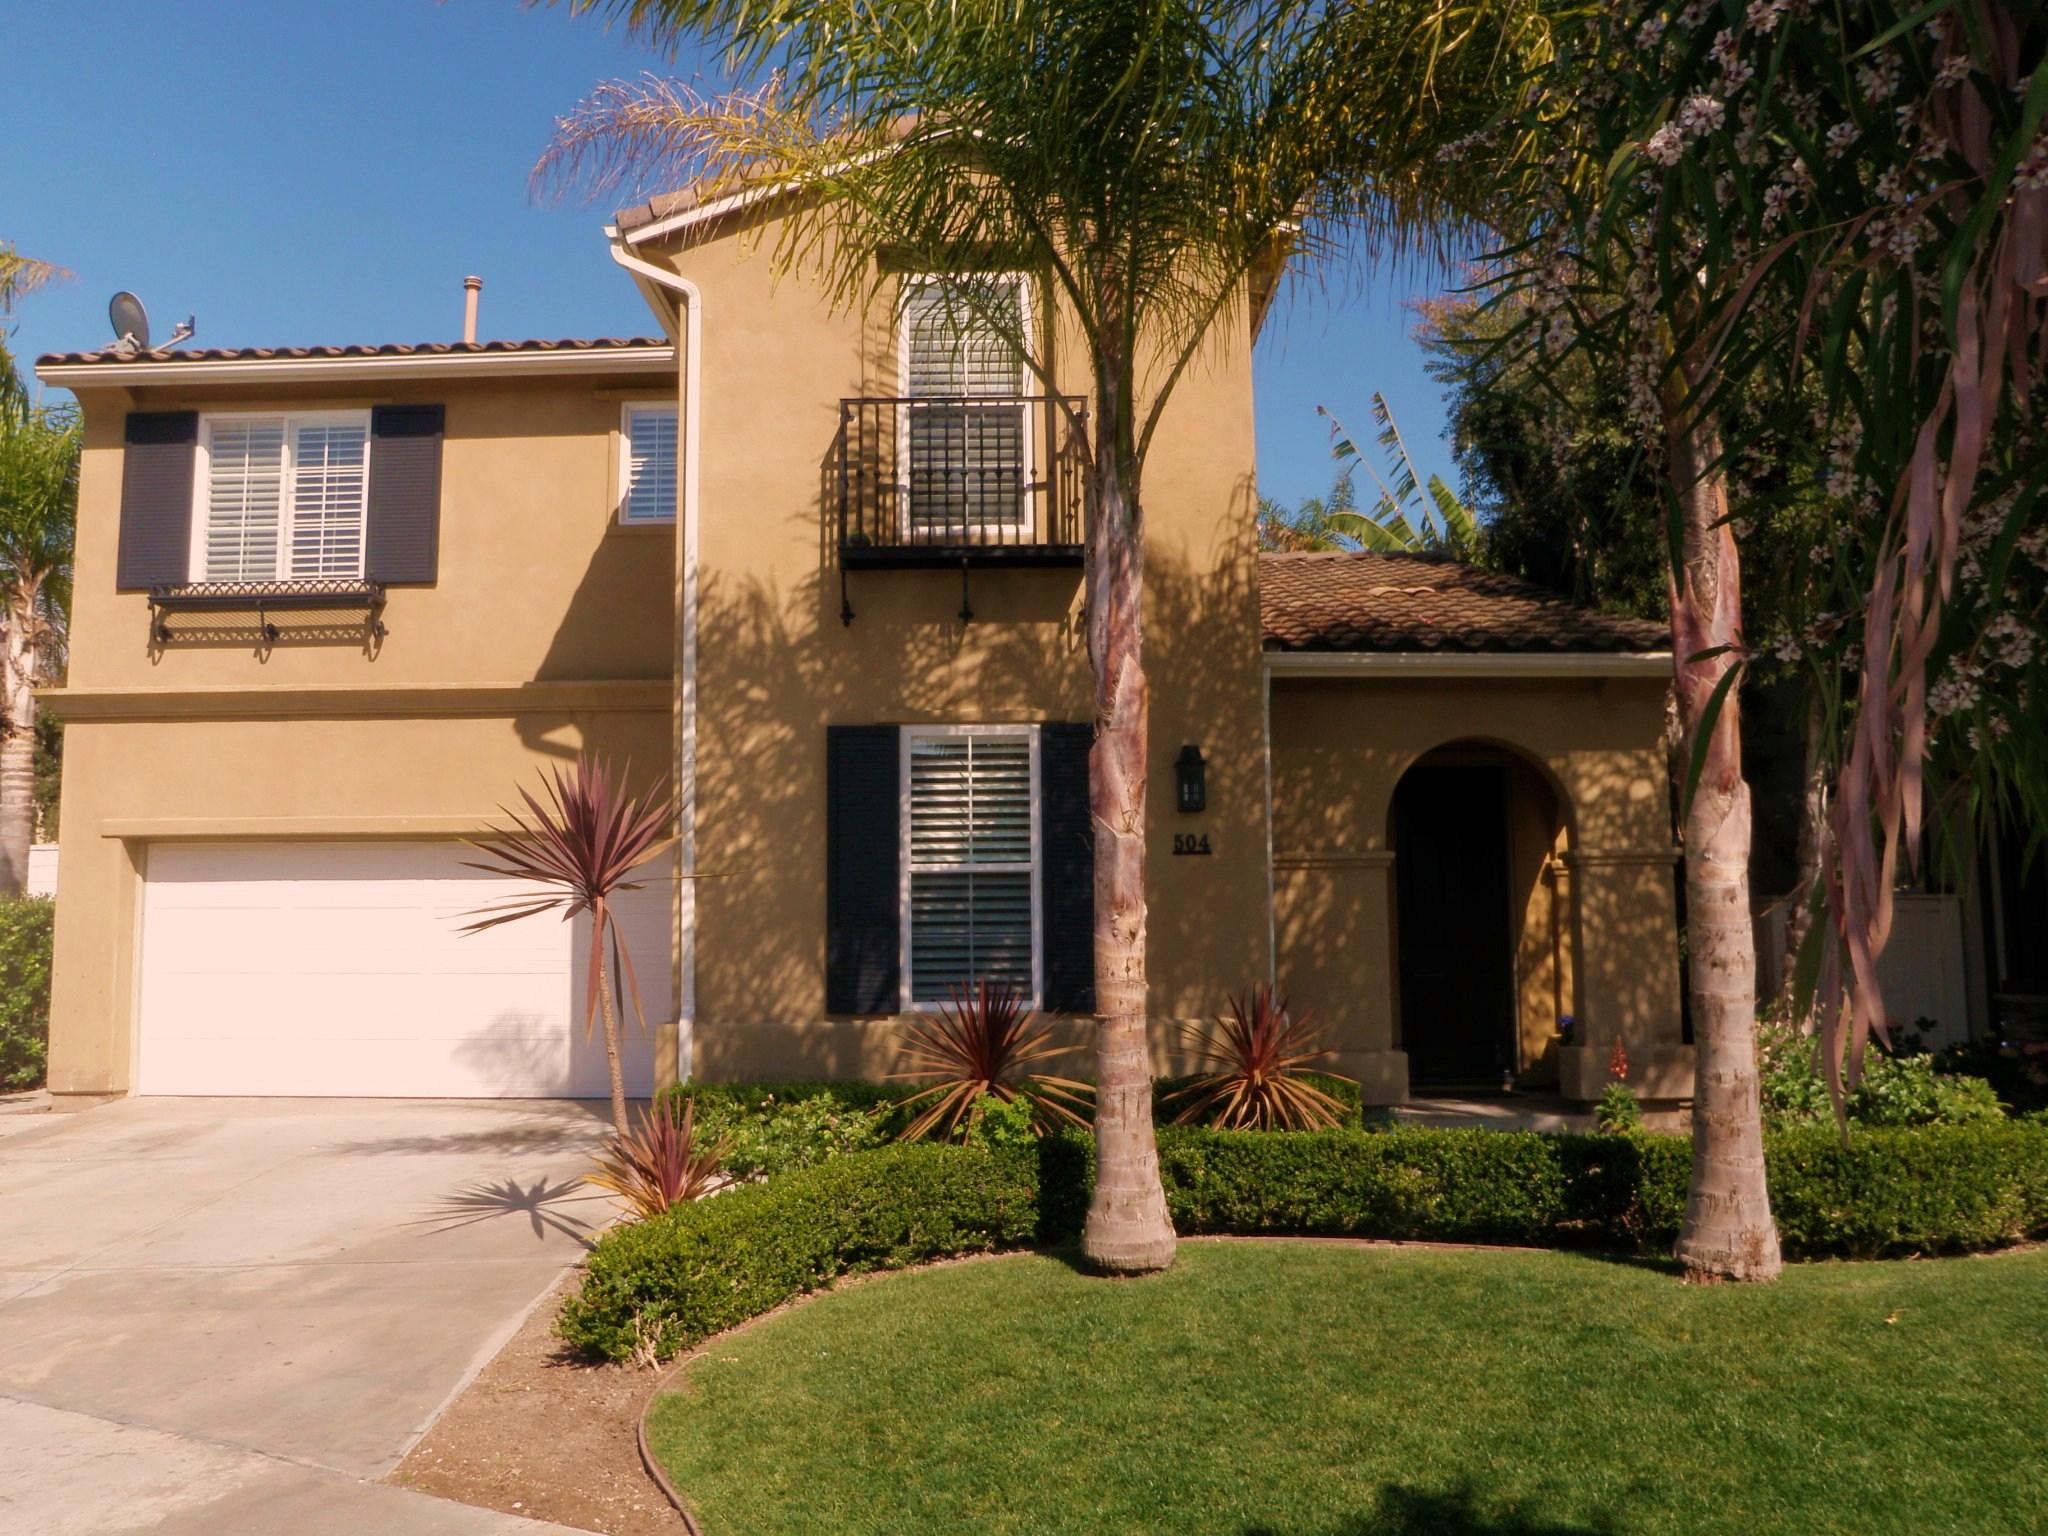 Single Family Home for Sale at San Clemente 504 Corte Del Oro San Clemente, California 92673 United States